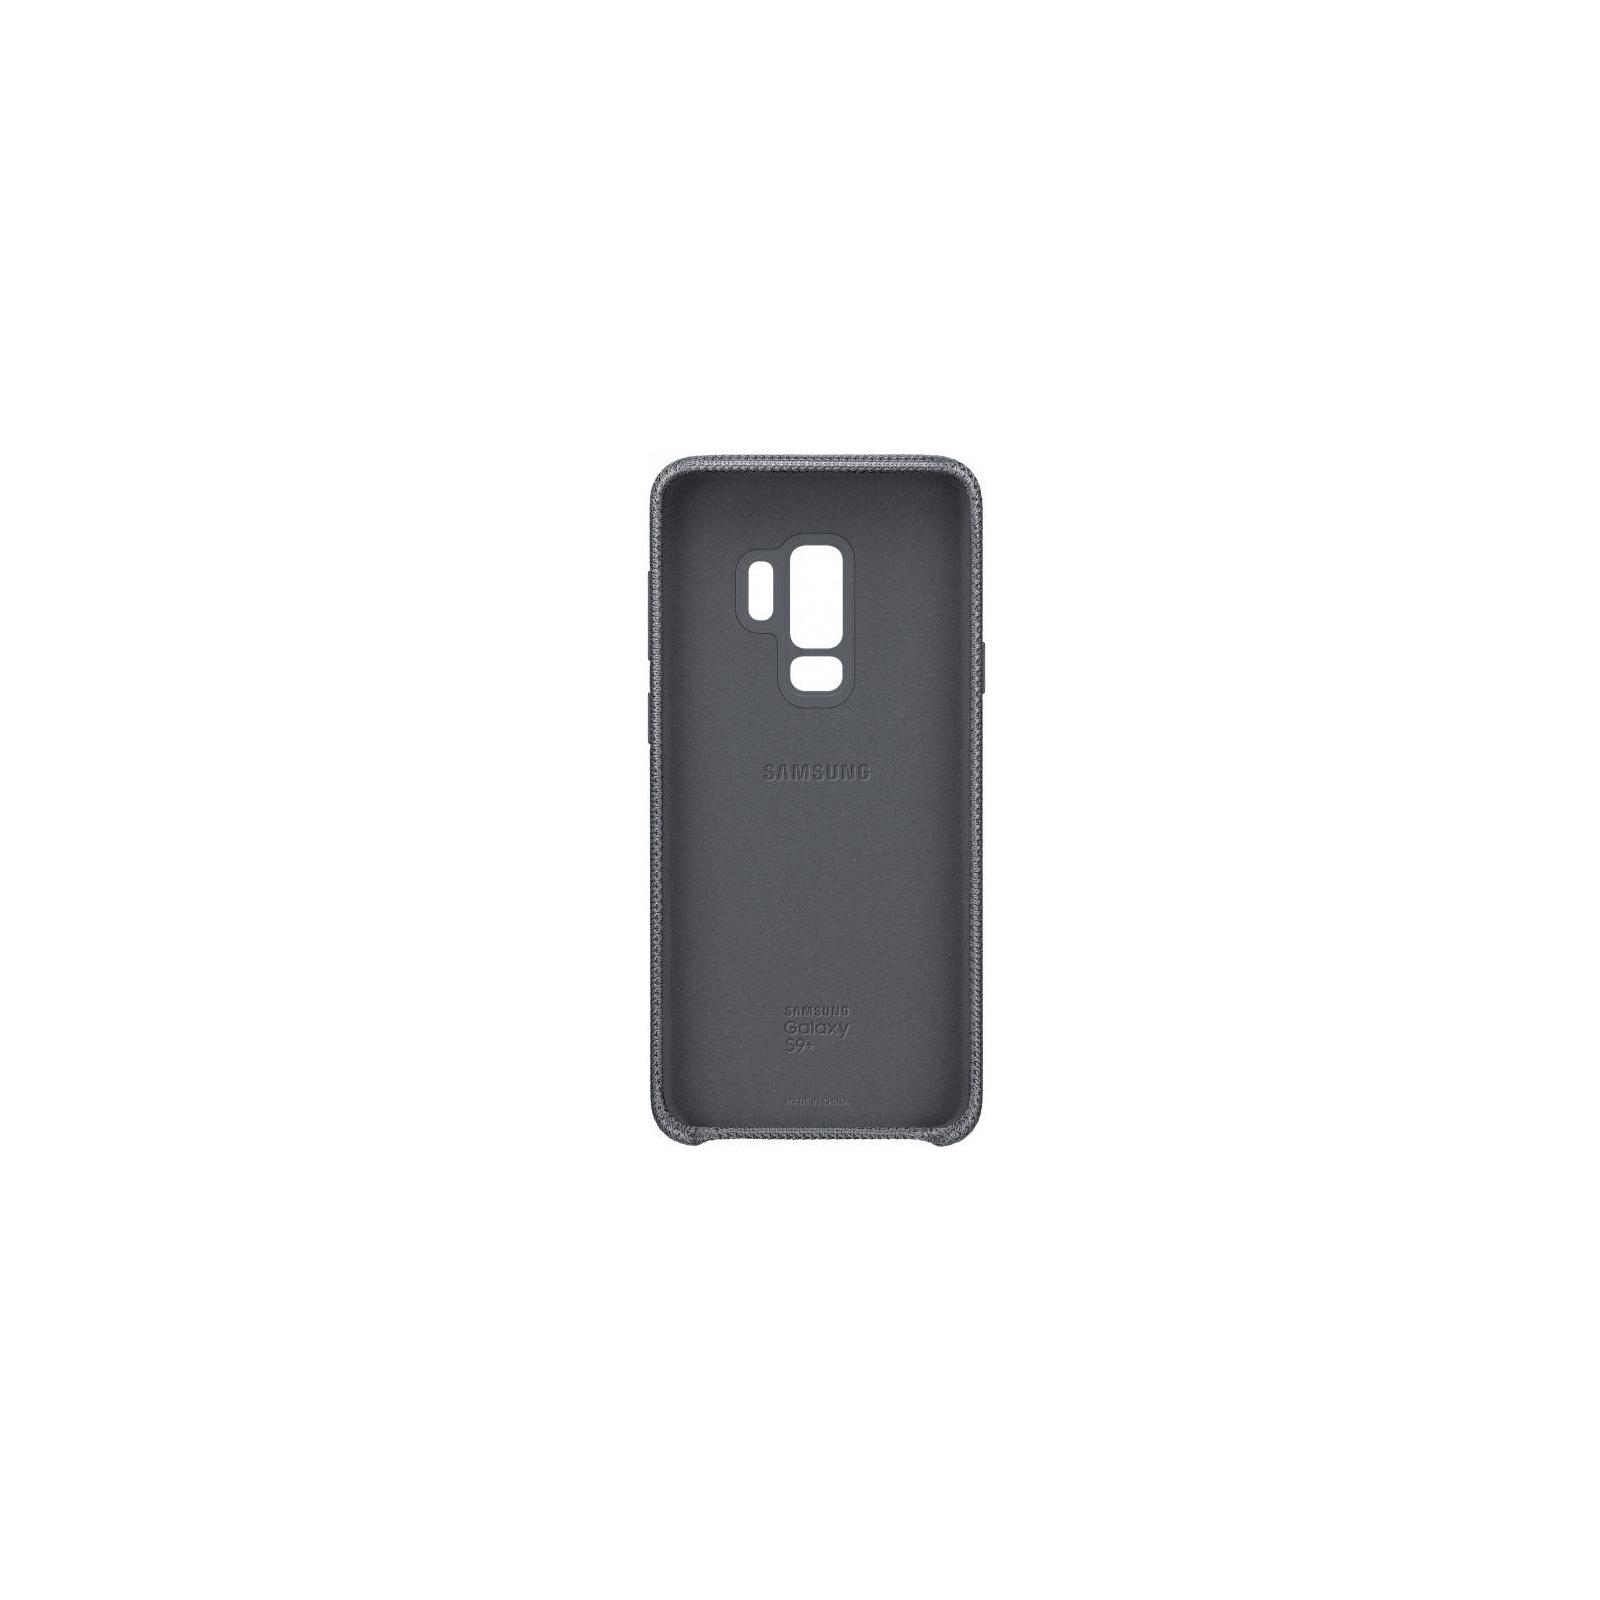 Чехол для моб. телефона Samsung для Galaxy S9+ (G965) Hyperknit Cover Grey (EF-GG965FJEGRU) изображение 2